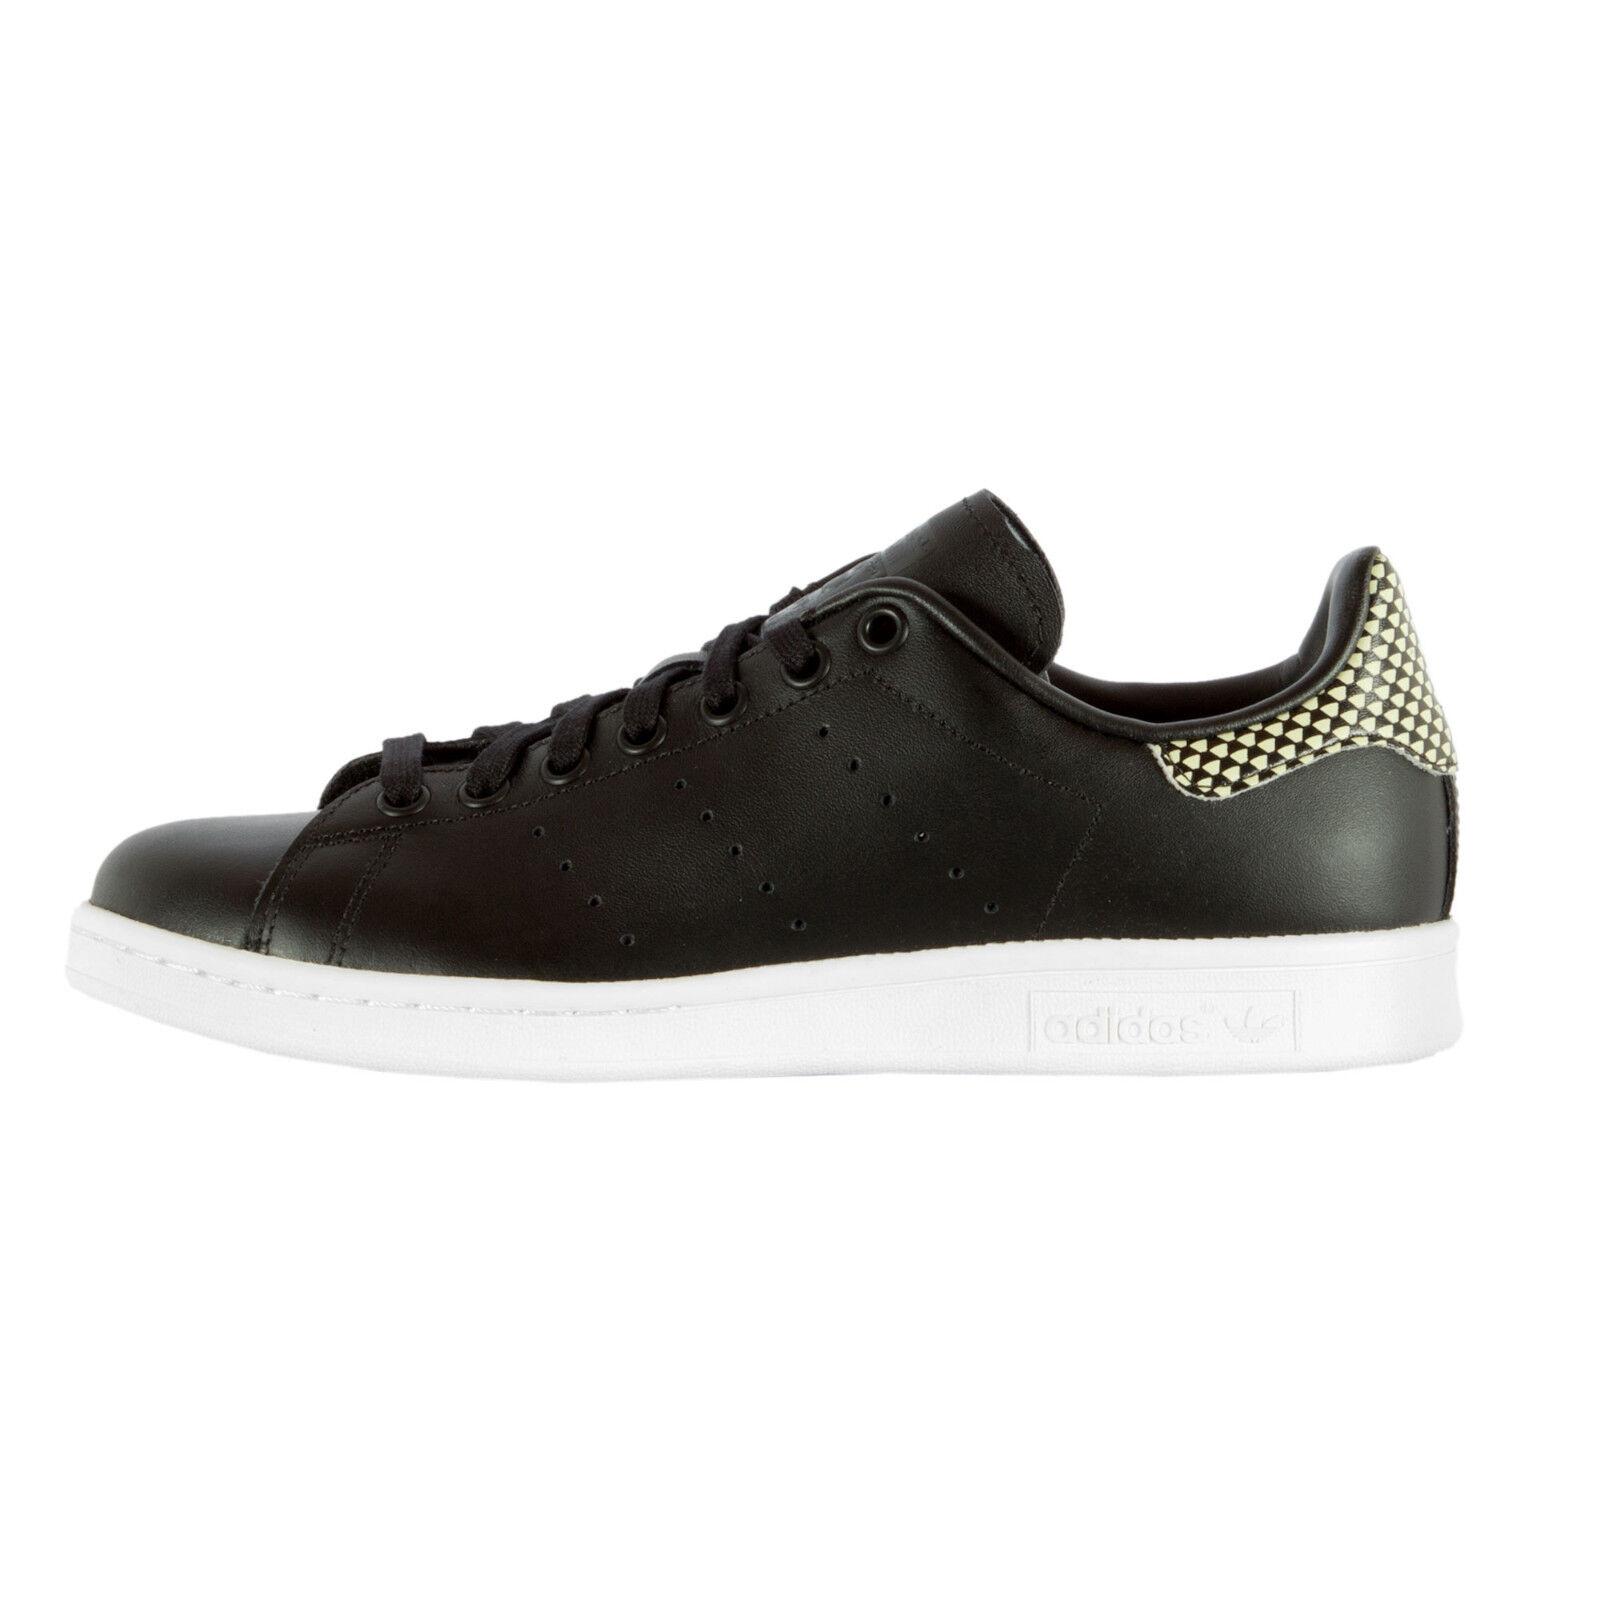 adidas Herren Sneaker S75318 Stan Smith Black Schwarz  / 40 / Turnschuhe